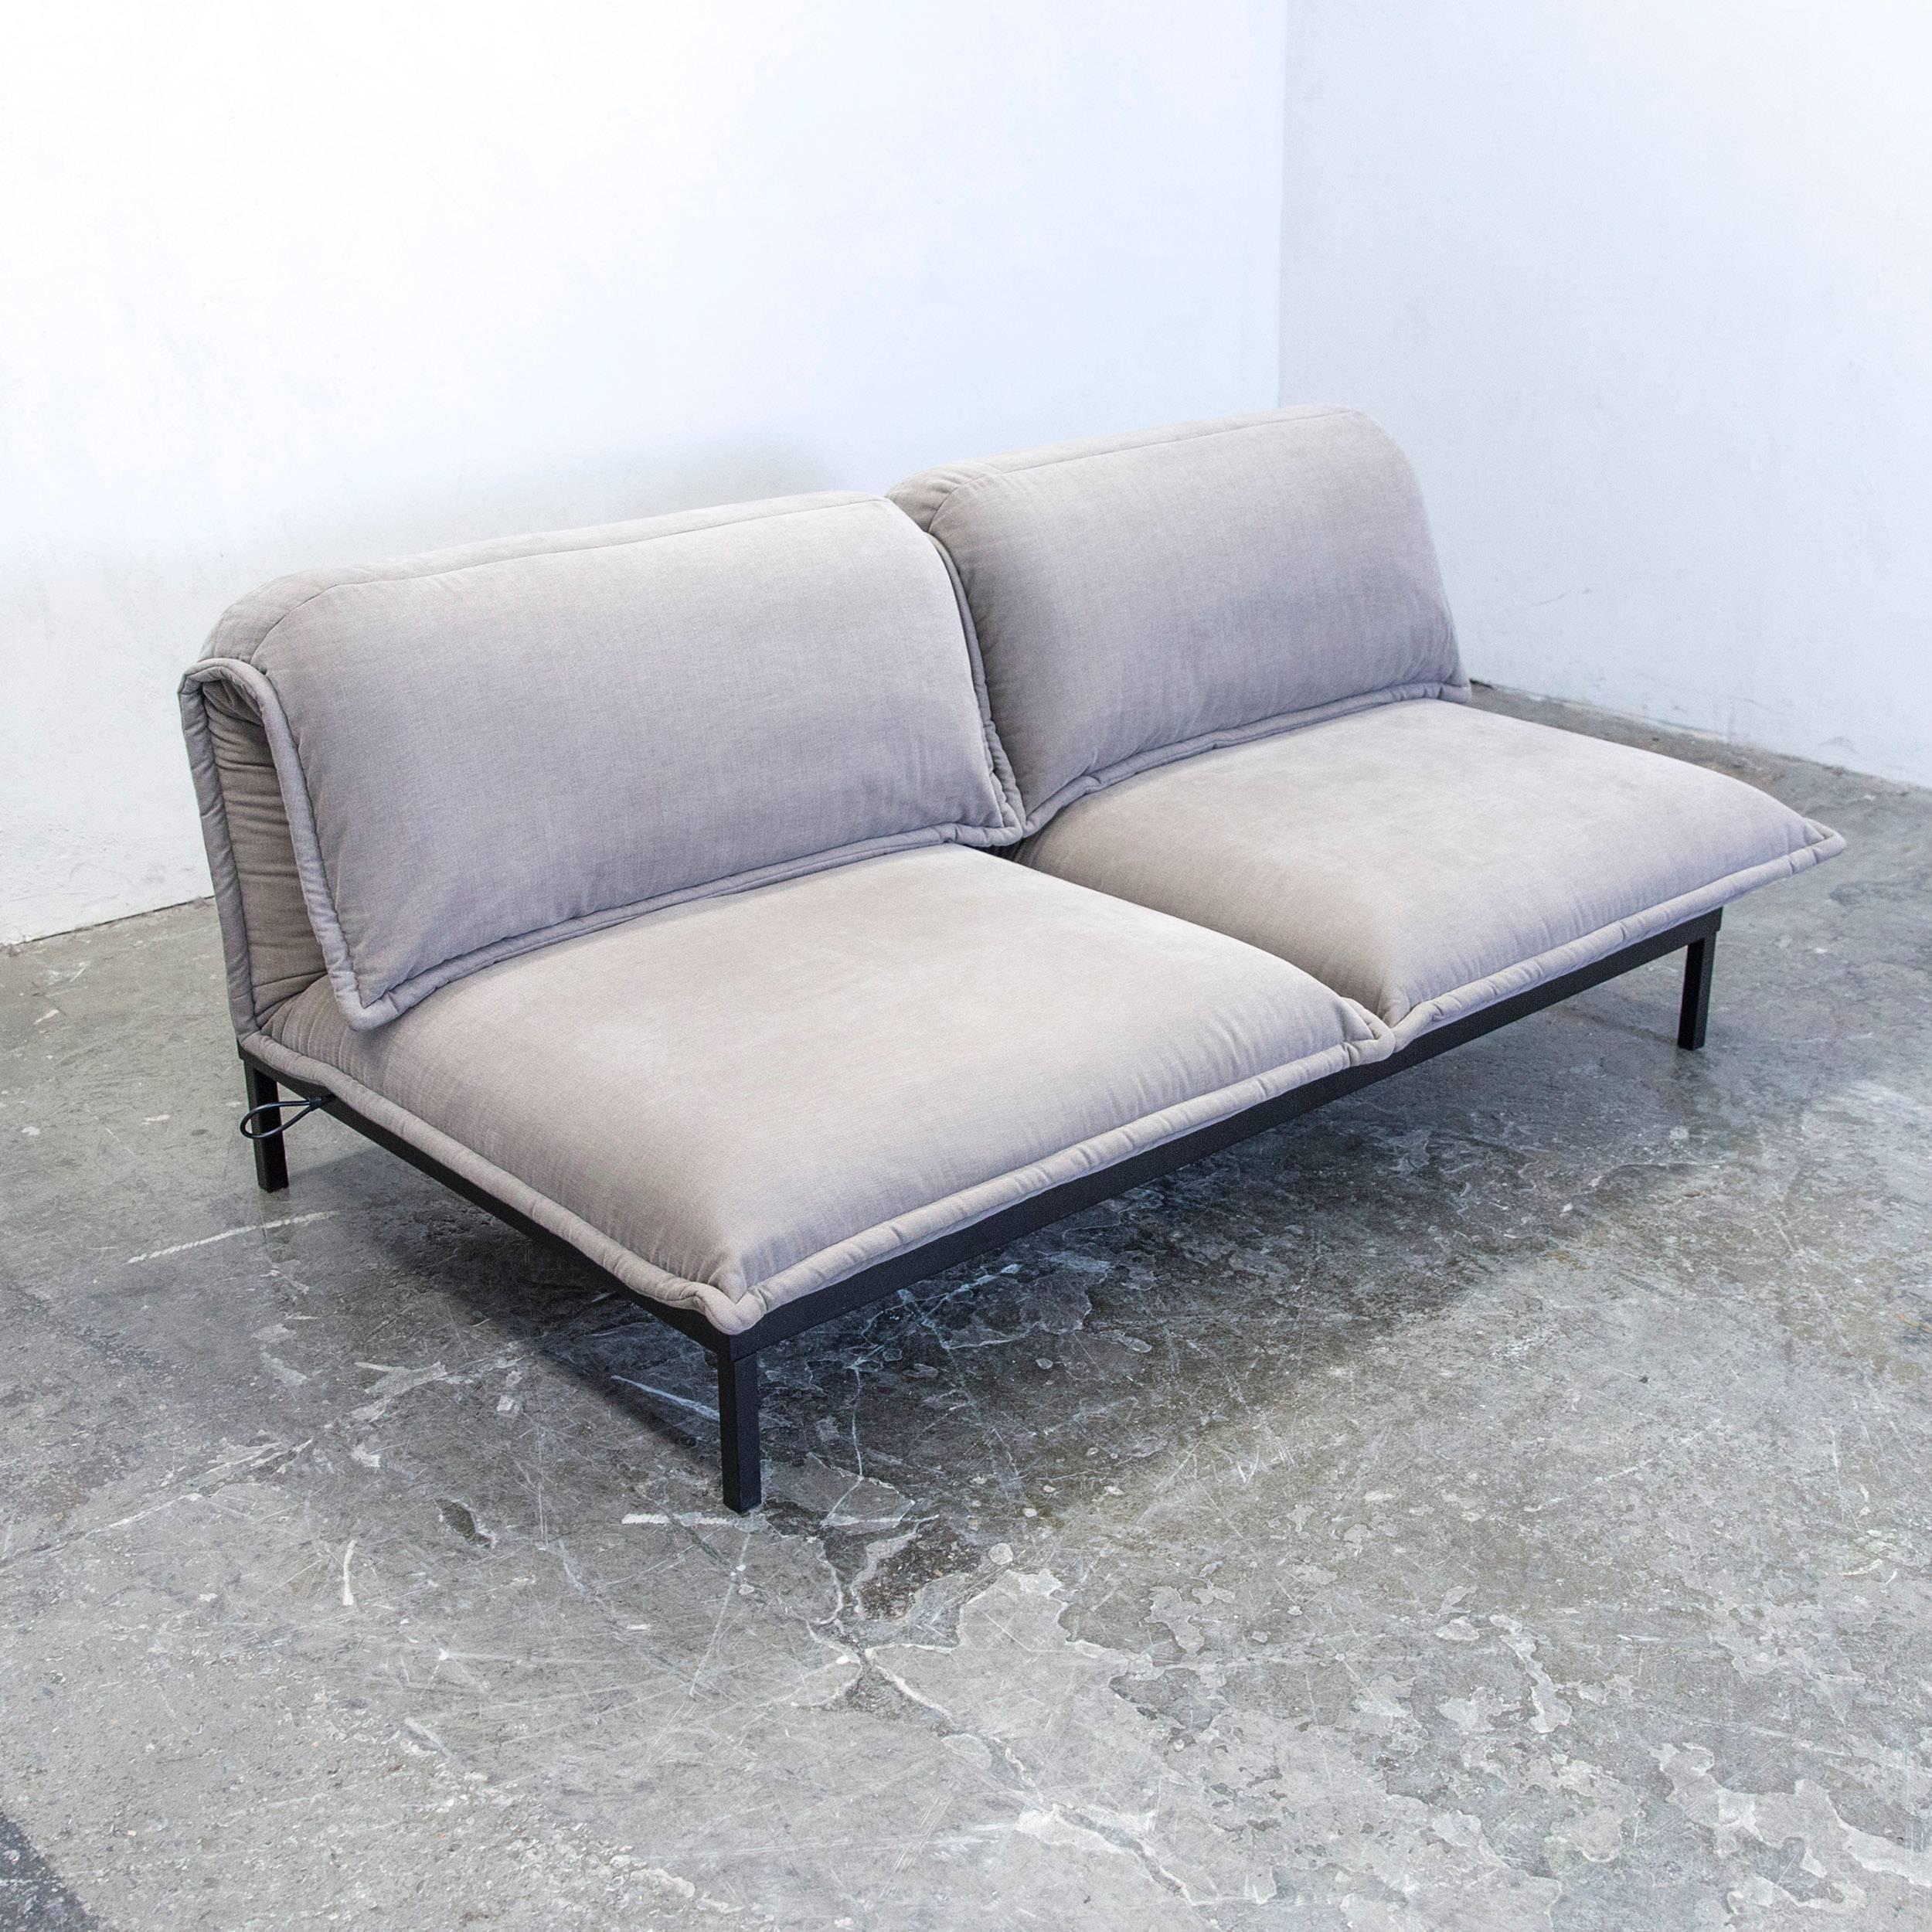 Finest Grey Colored Original Rolf Benz Nova Designer Sofa In A And Modern  Design With Sthle Modern Grau